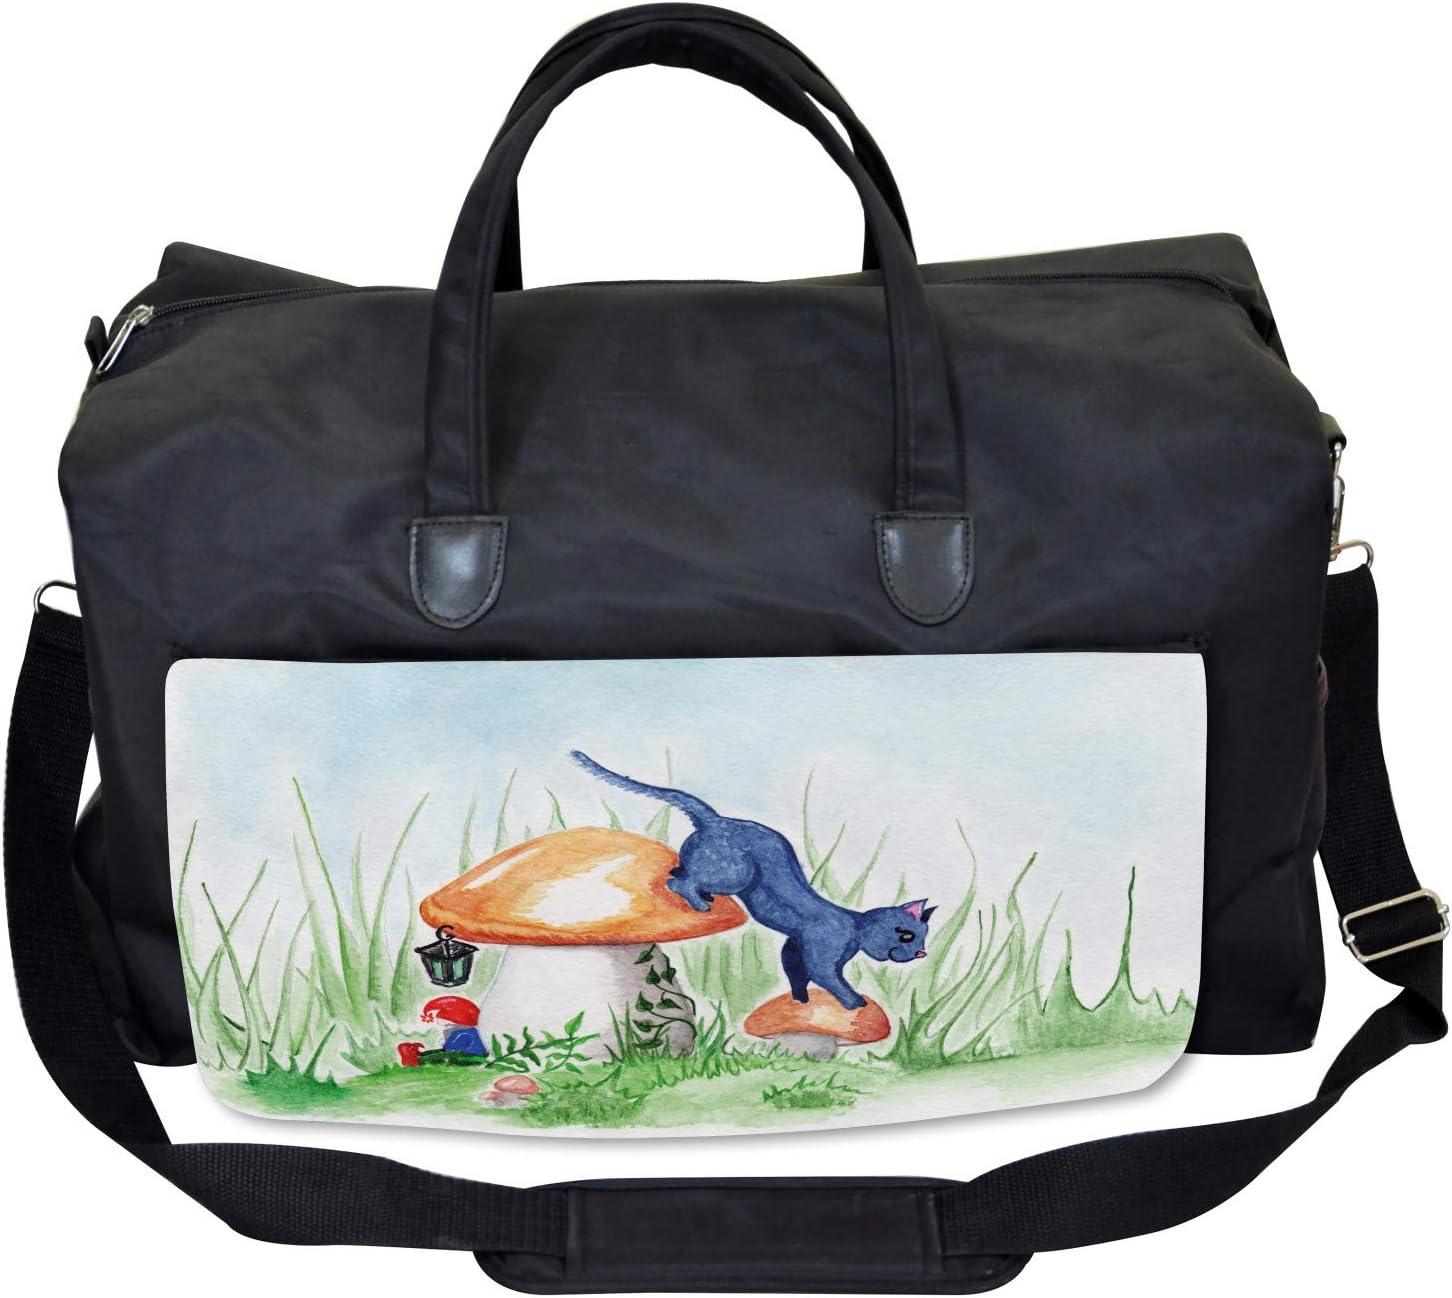 Ambesonne Animal Gym Bag Large Weekender Carry-on Mushroom Garden Leaf